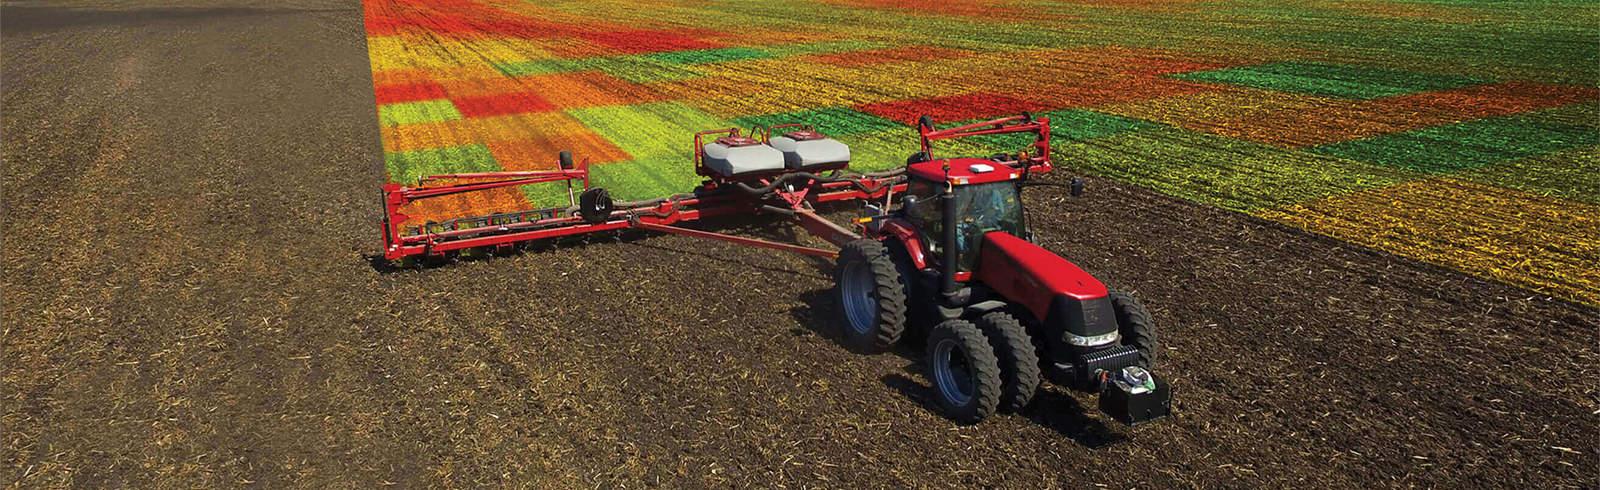 Tractor_ROI_Slider_1600x490